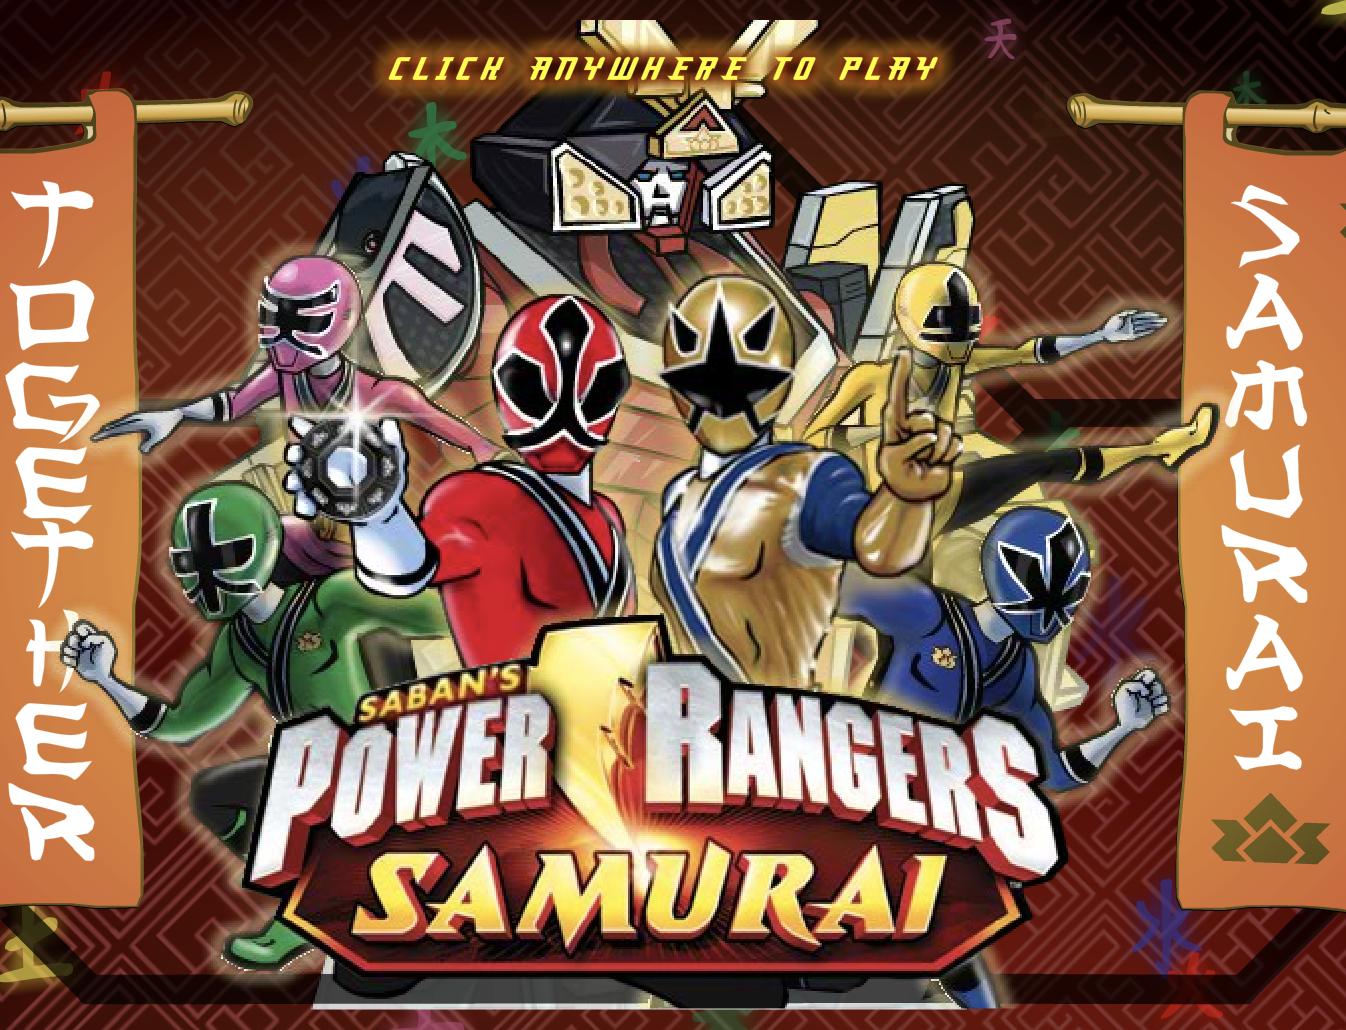 Play Power Rangers Rangers Together Samurai Forever Game Samurai Games Power Rangers Games Power Rangers Samurai